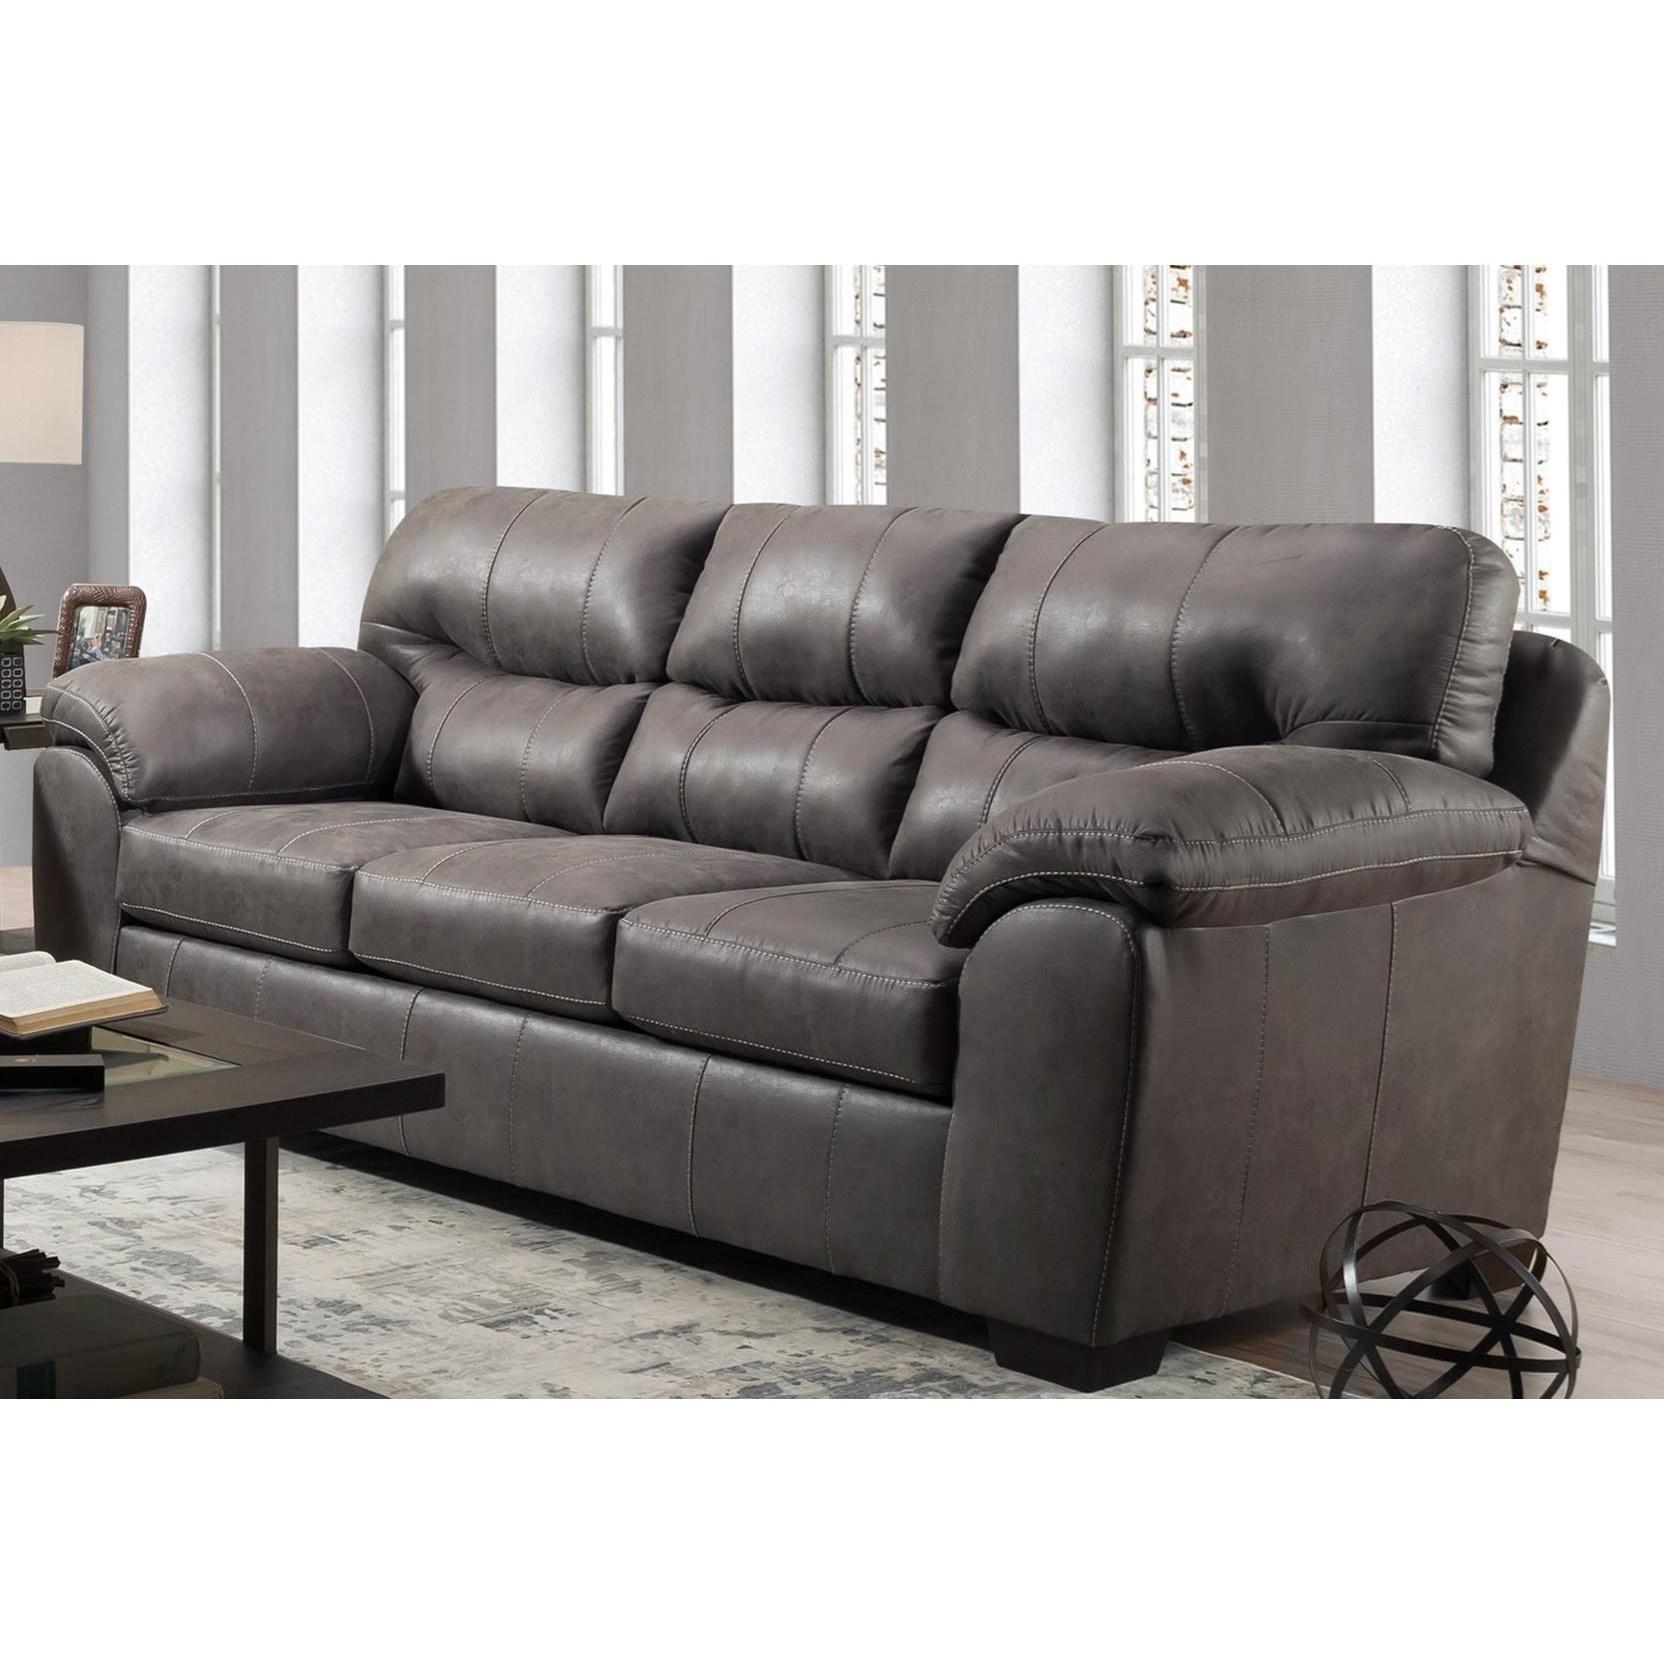 1780 Sofa by Peak Living at Prime Brothers Furniture